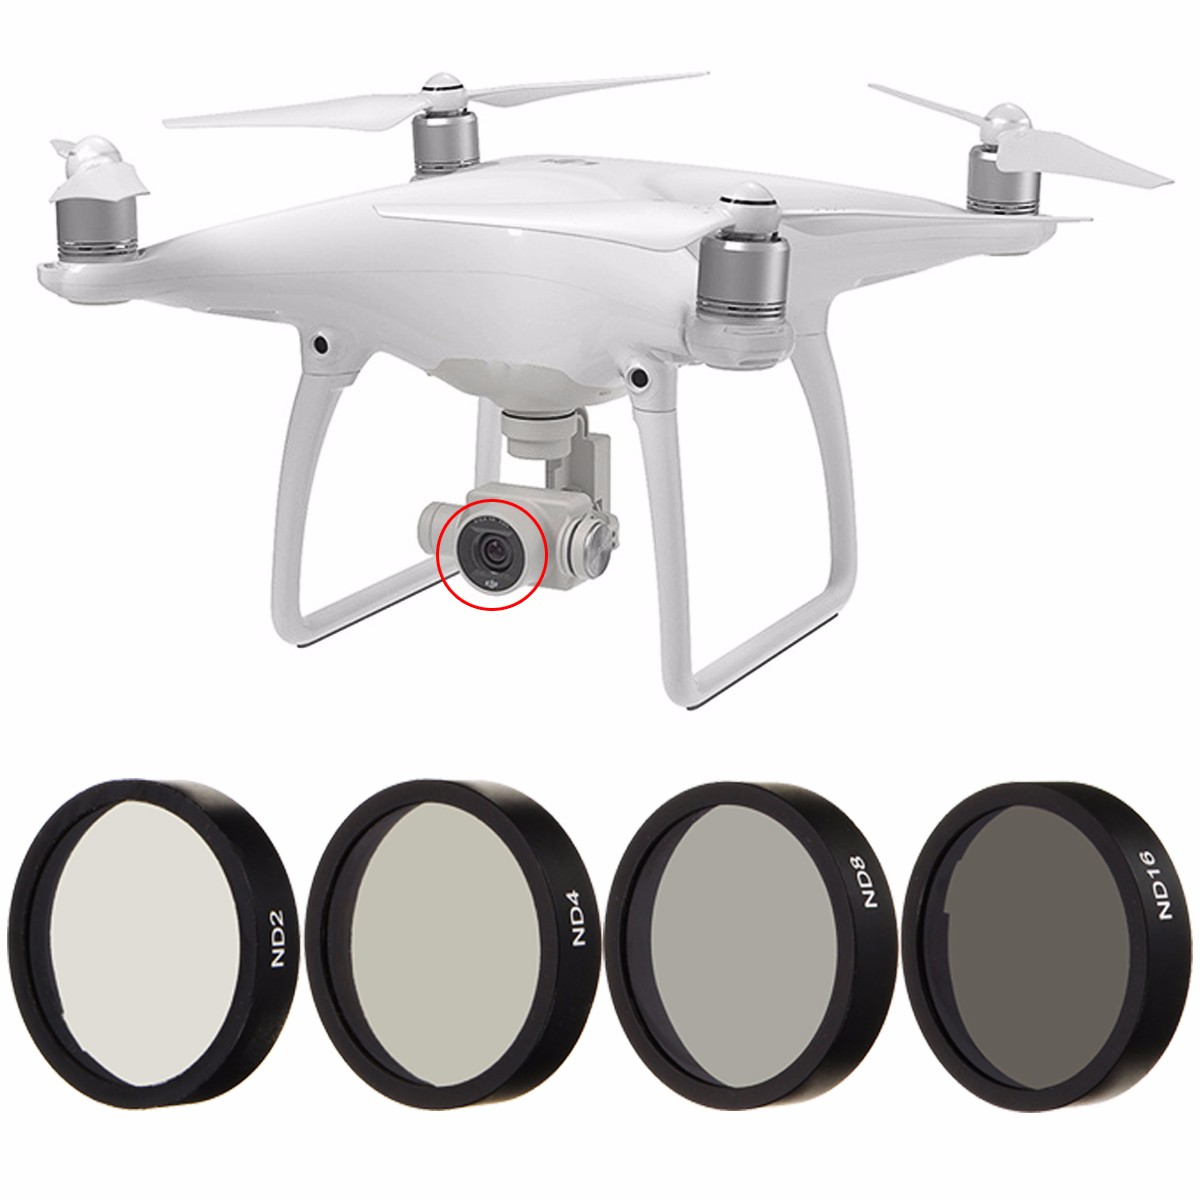 New 4pc ND2 ND4 ND8 ND16 Len Filter for DJI Phantom 3 4 Professional Advanced Camera Camera Drone Lens Set Black Frame